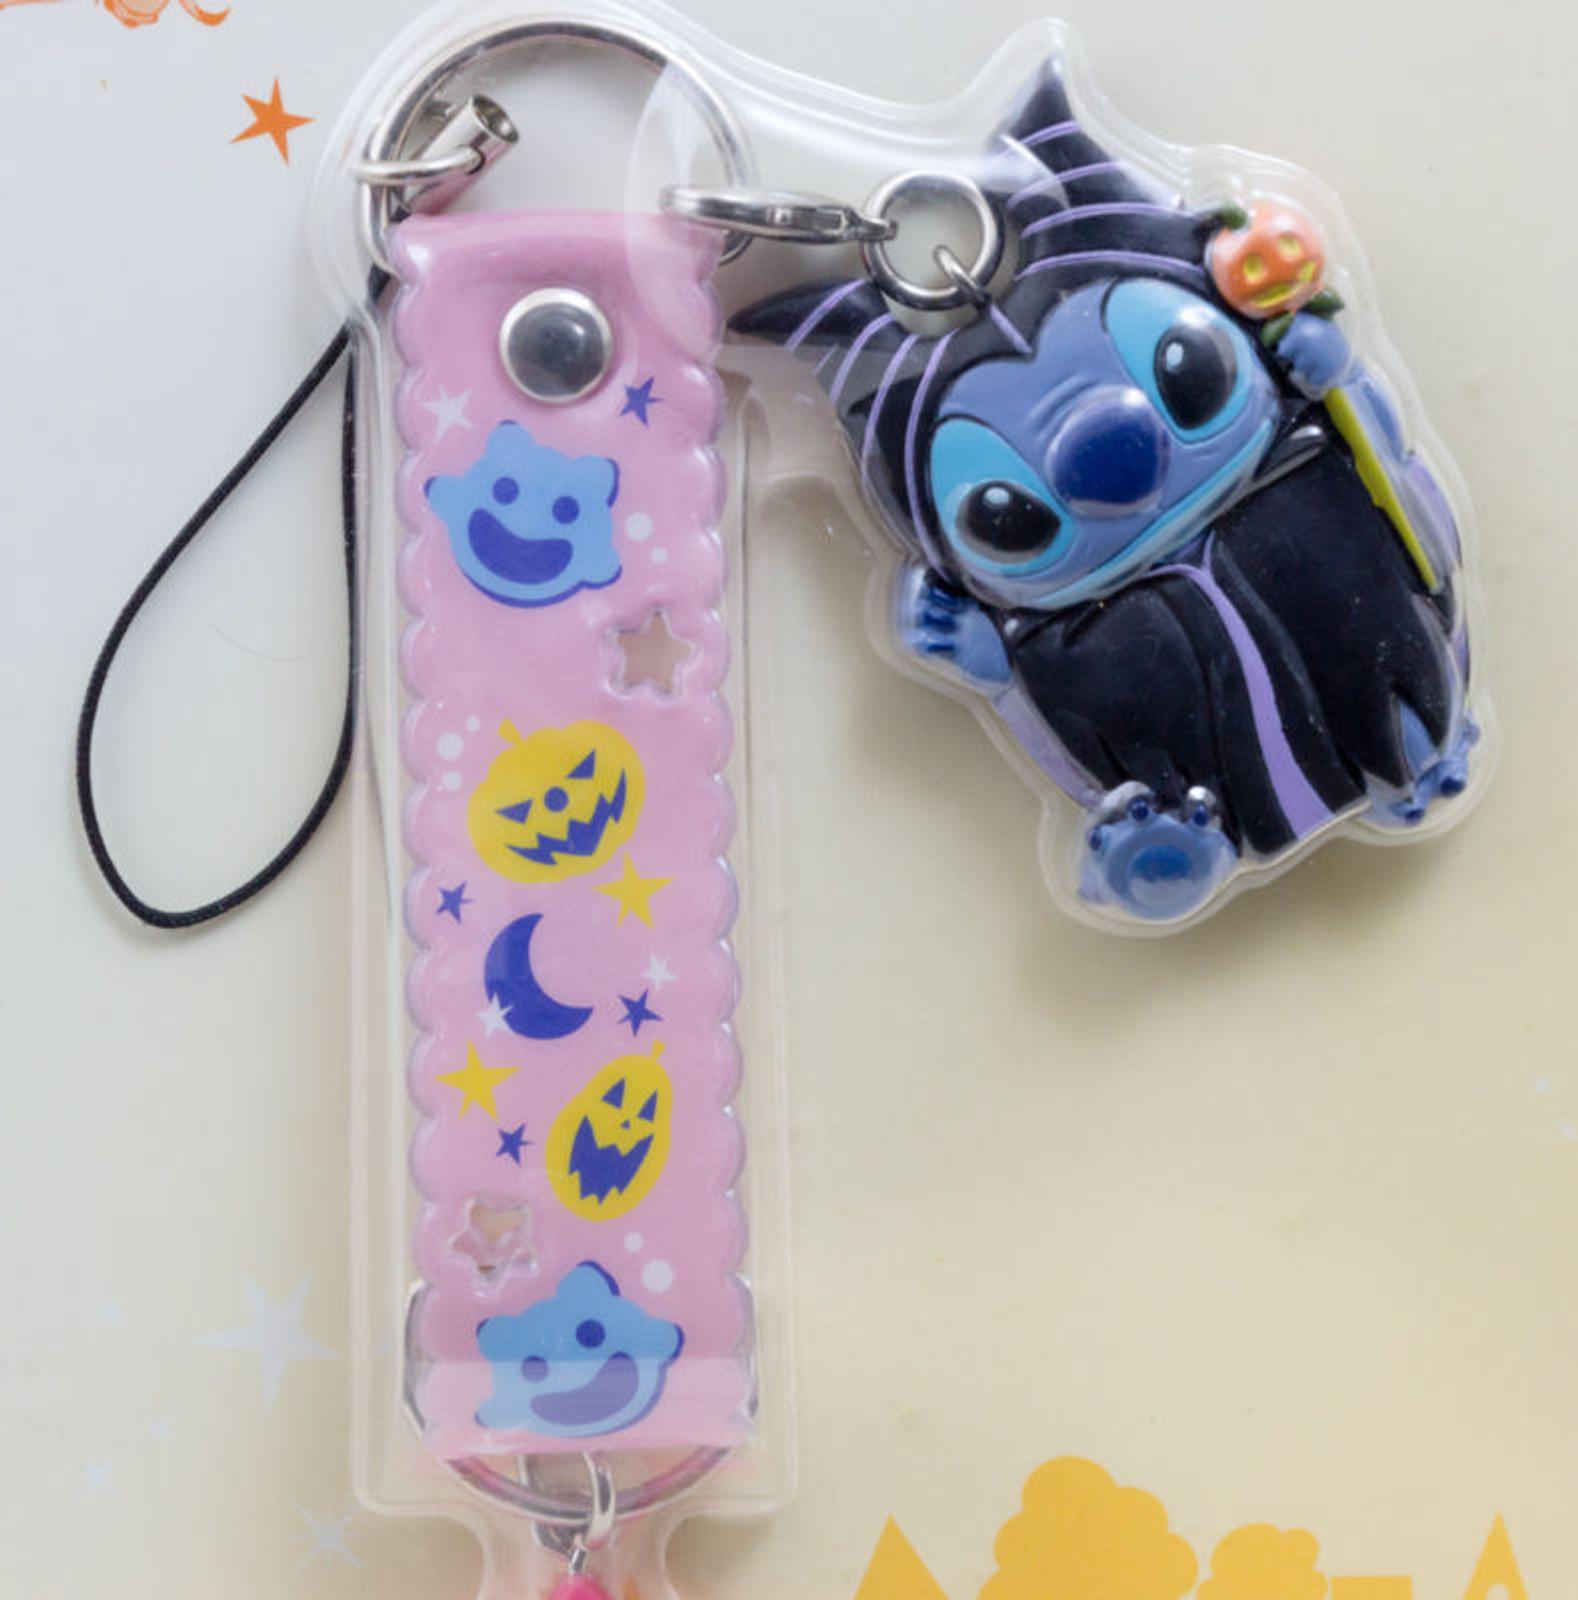 Disney Stitch Mobile Strap Halloween Ver. Mascot Figure Banpresto 3 JAPAN ANIME